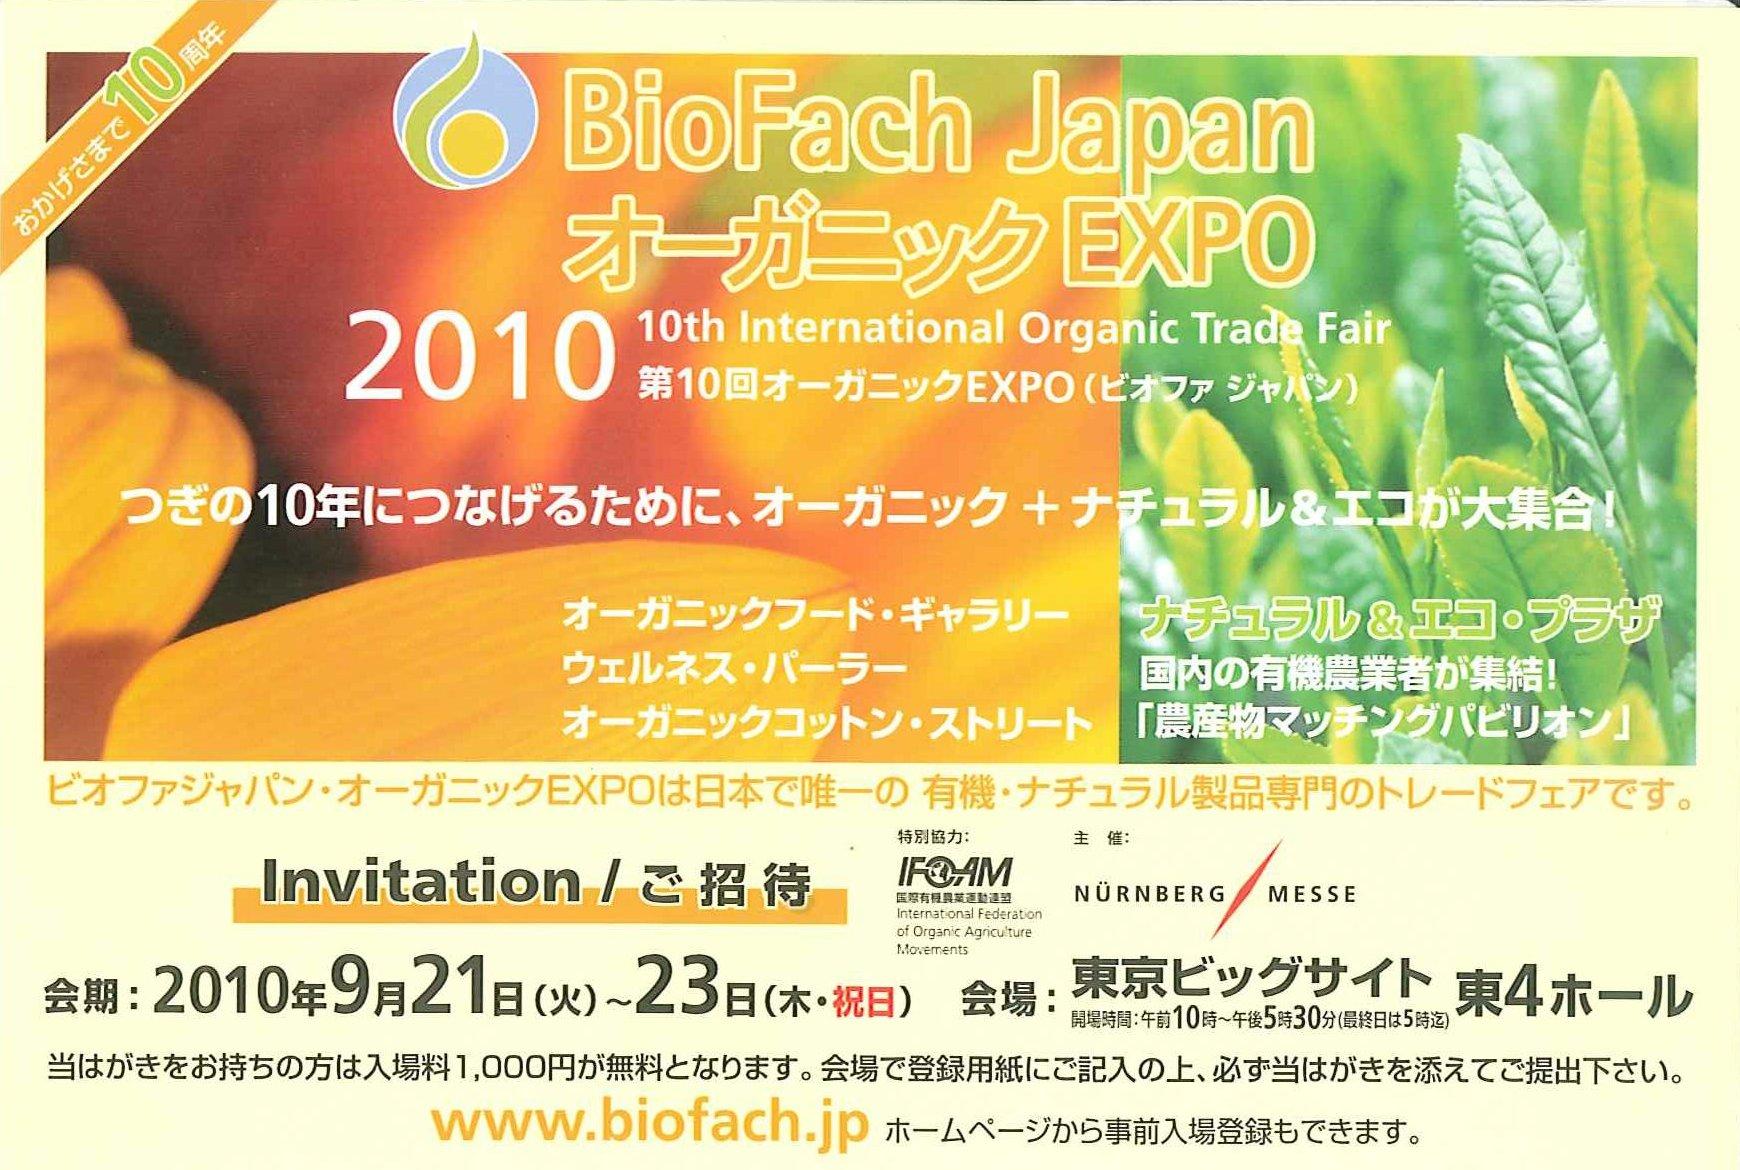 BioFach Janap オーガニックEXPO_d0004728_13453413.jpg